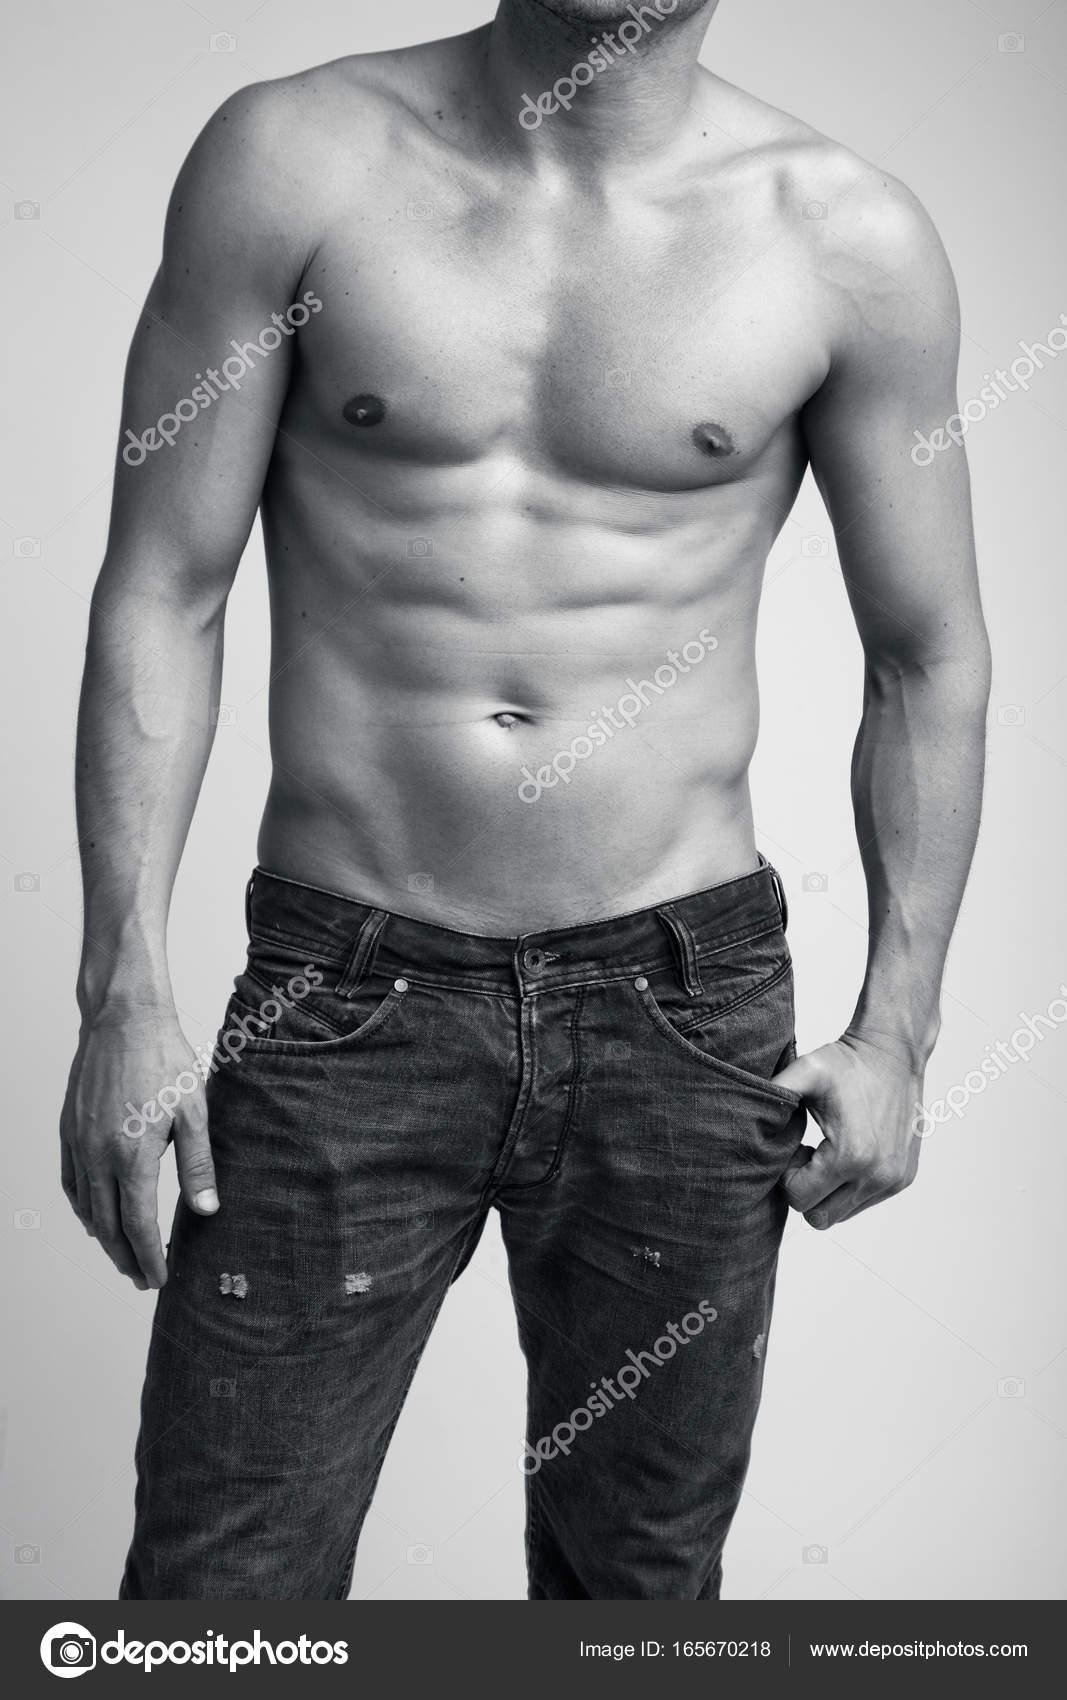 Male nude torso